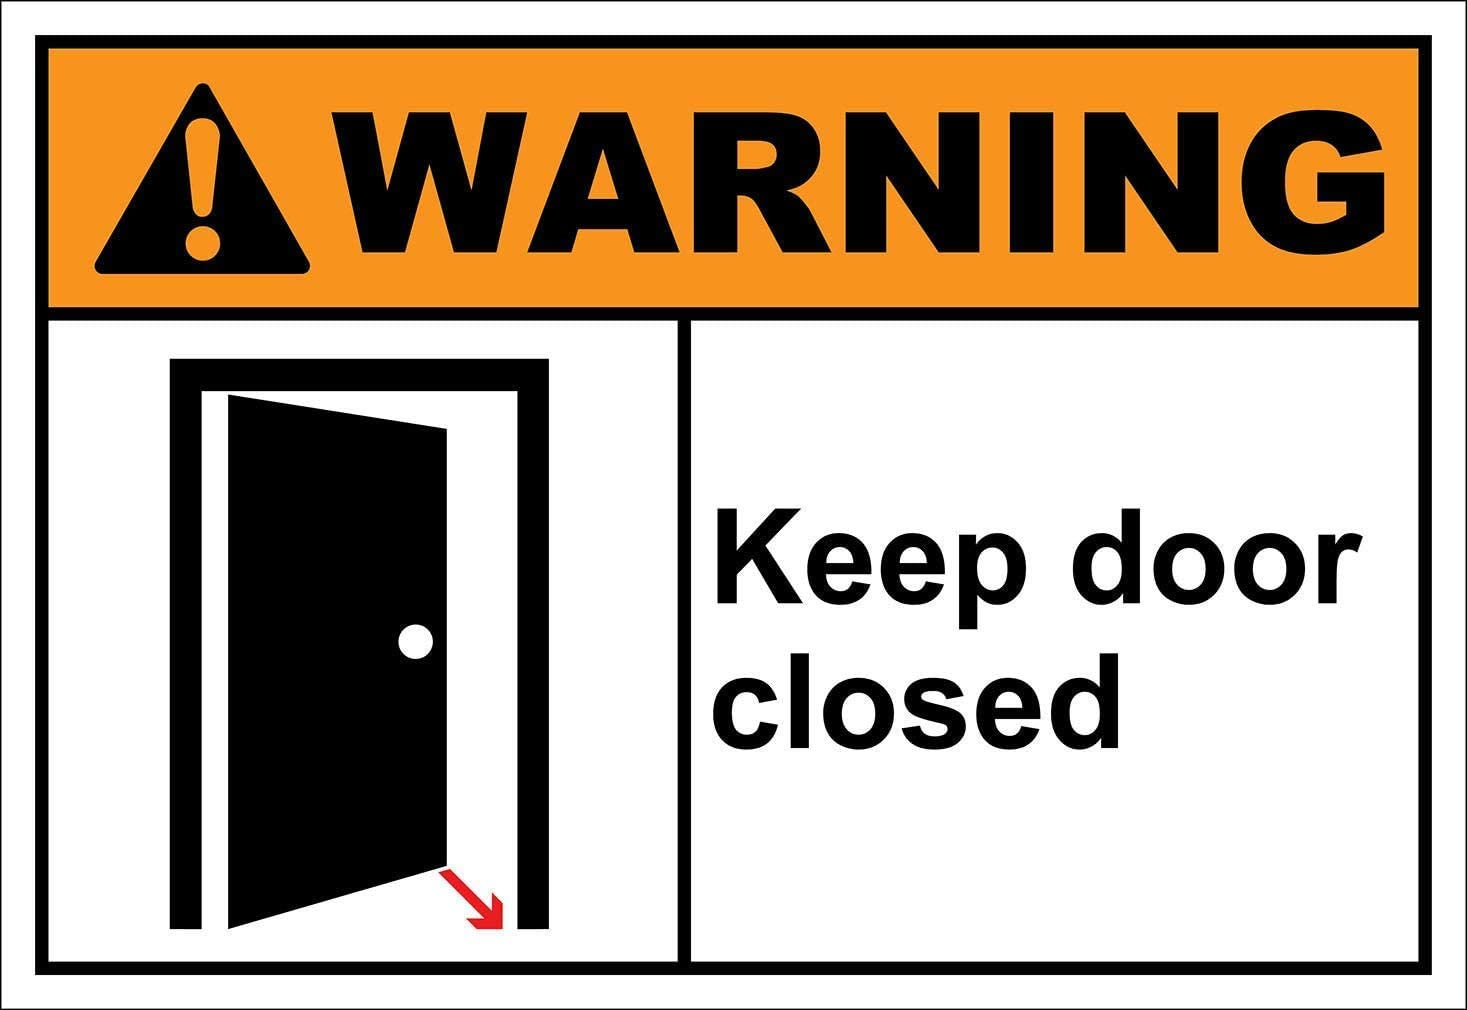 Keep Door Closed Warning,Warning Traffic Safety Notice Road Street 12'' X 16'' Metal Tin Sign